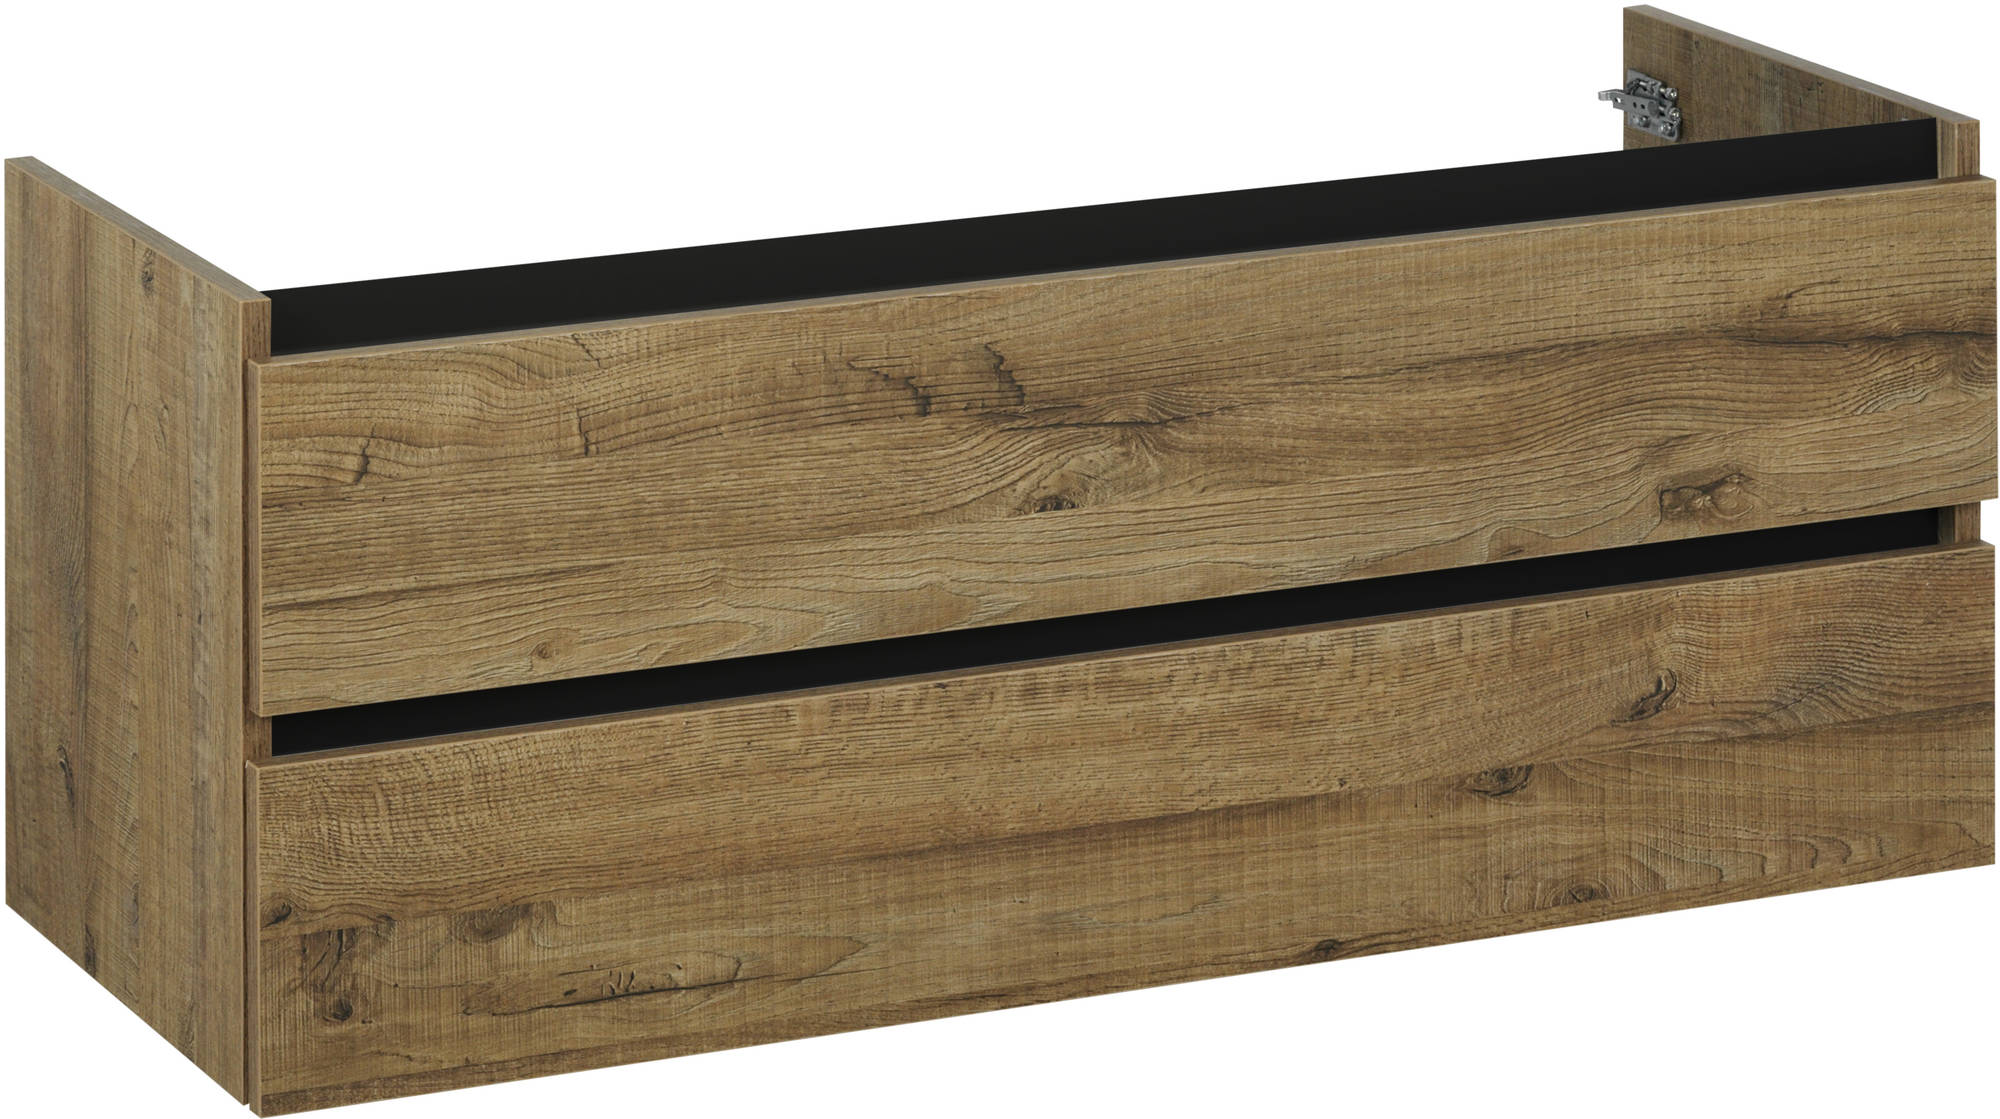 Ben Limara Wastafelonderkast 2 laden, 140x44,5x50 cm, Sherwood mat zwart